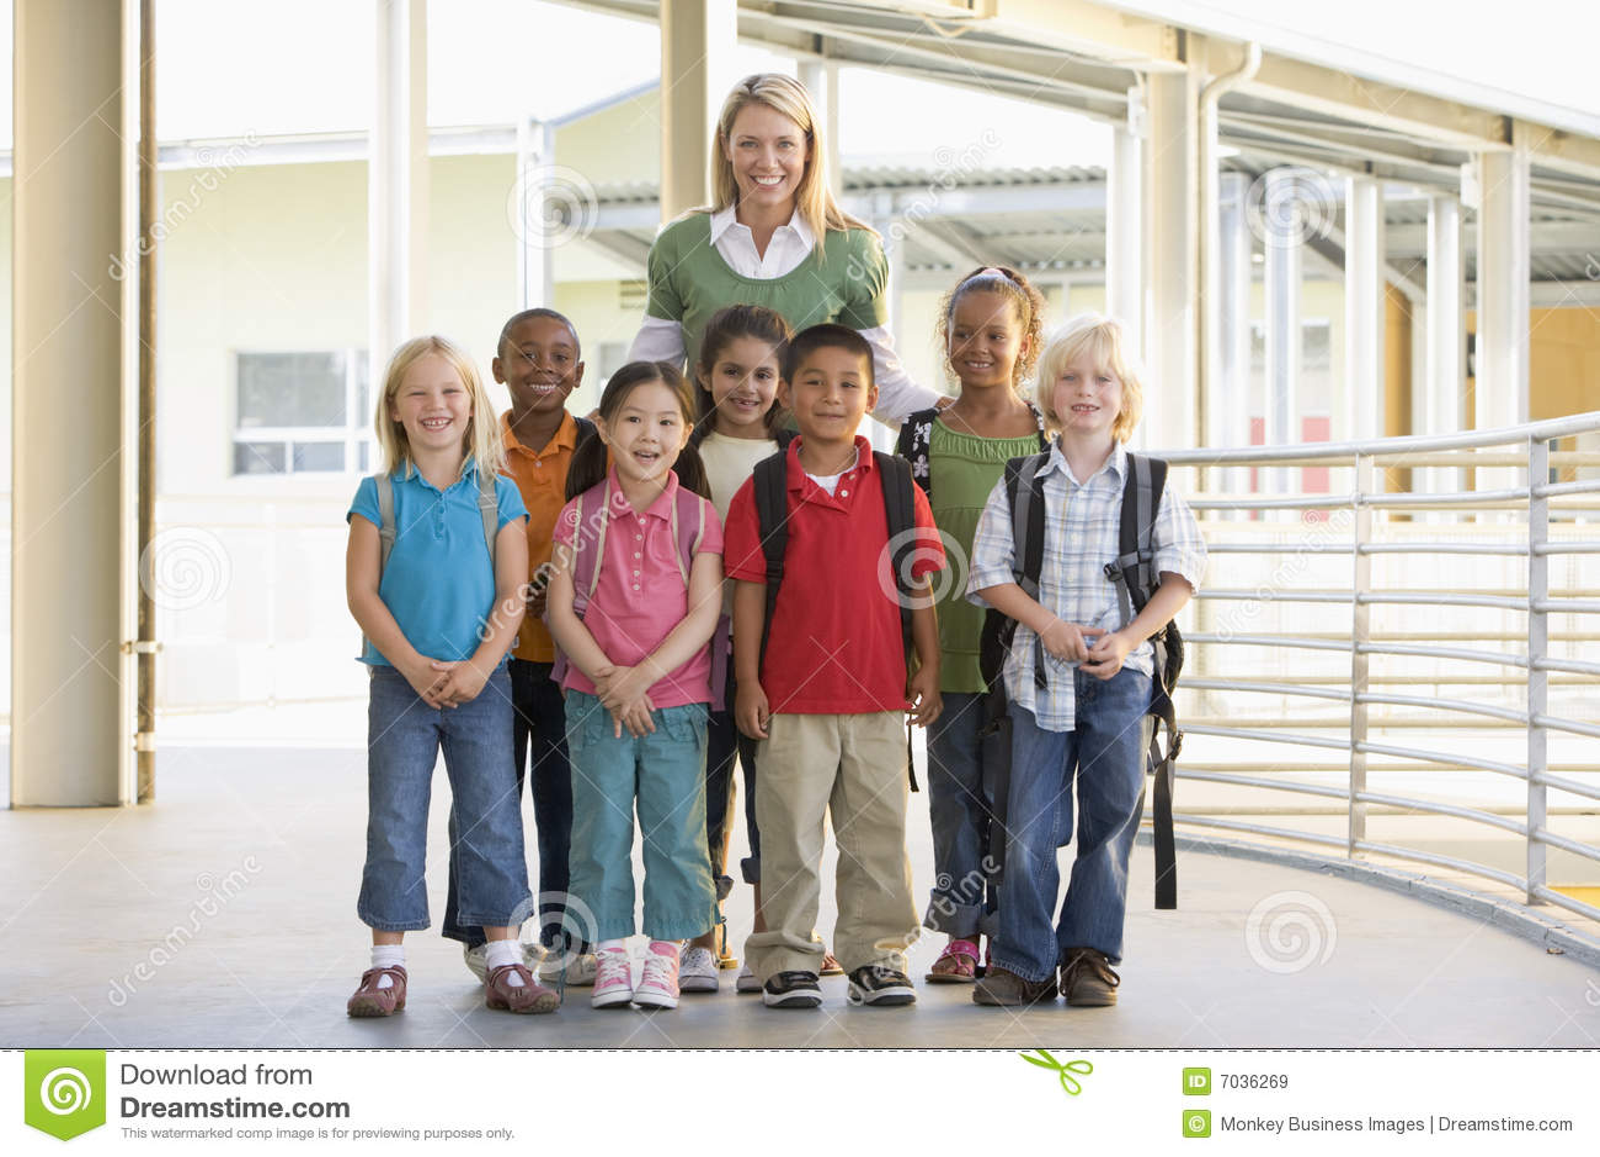 Kindergarten teacher standing with children